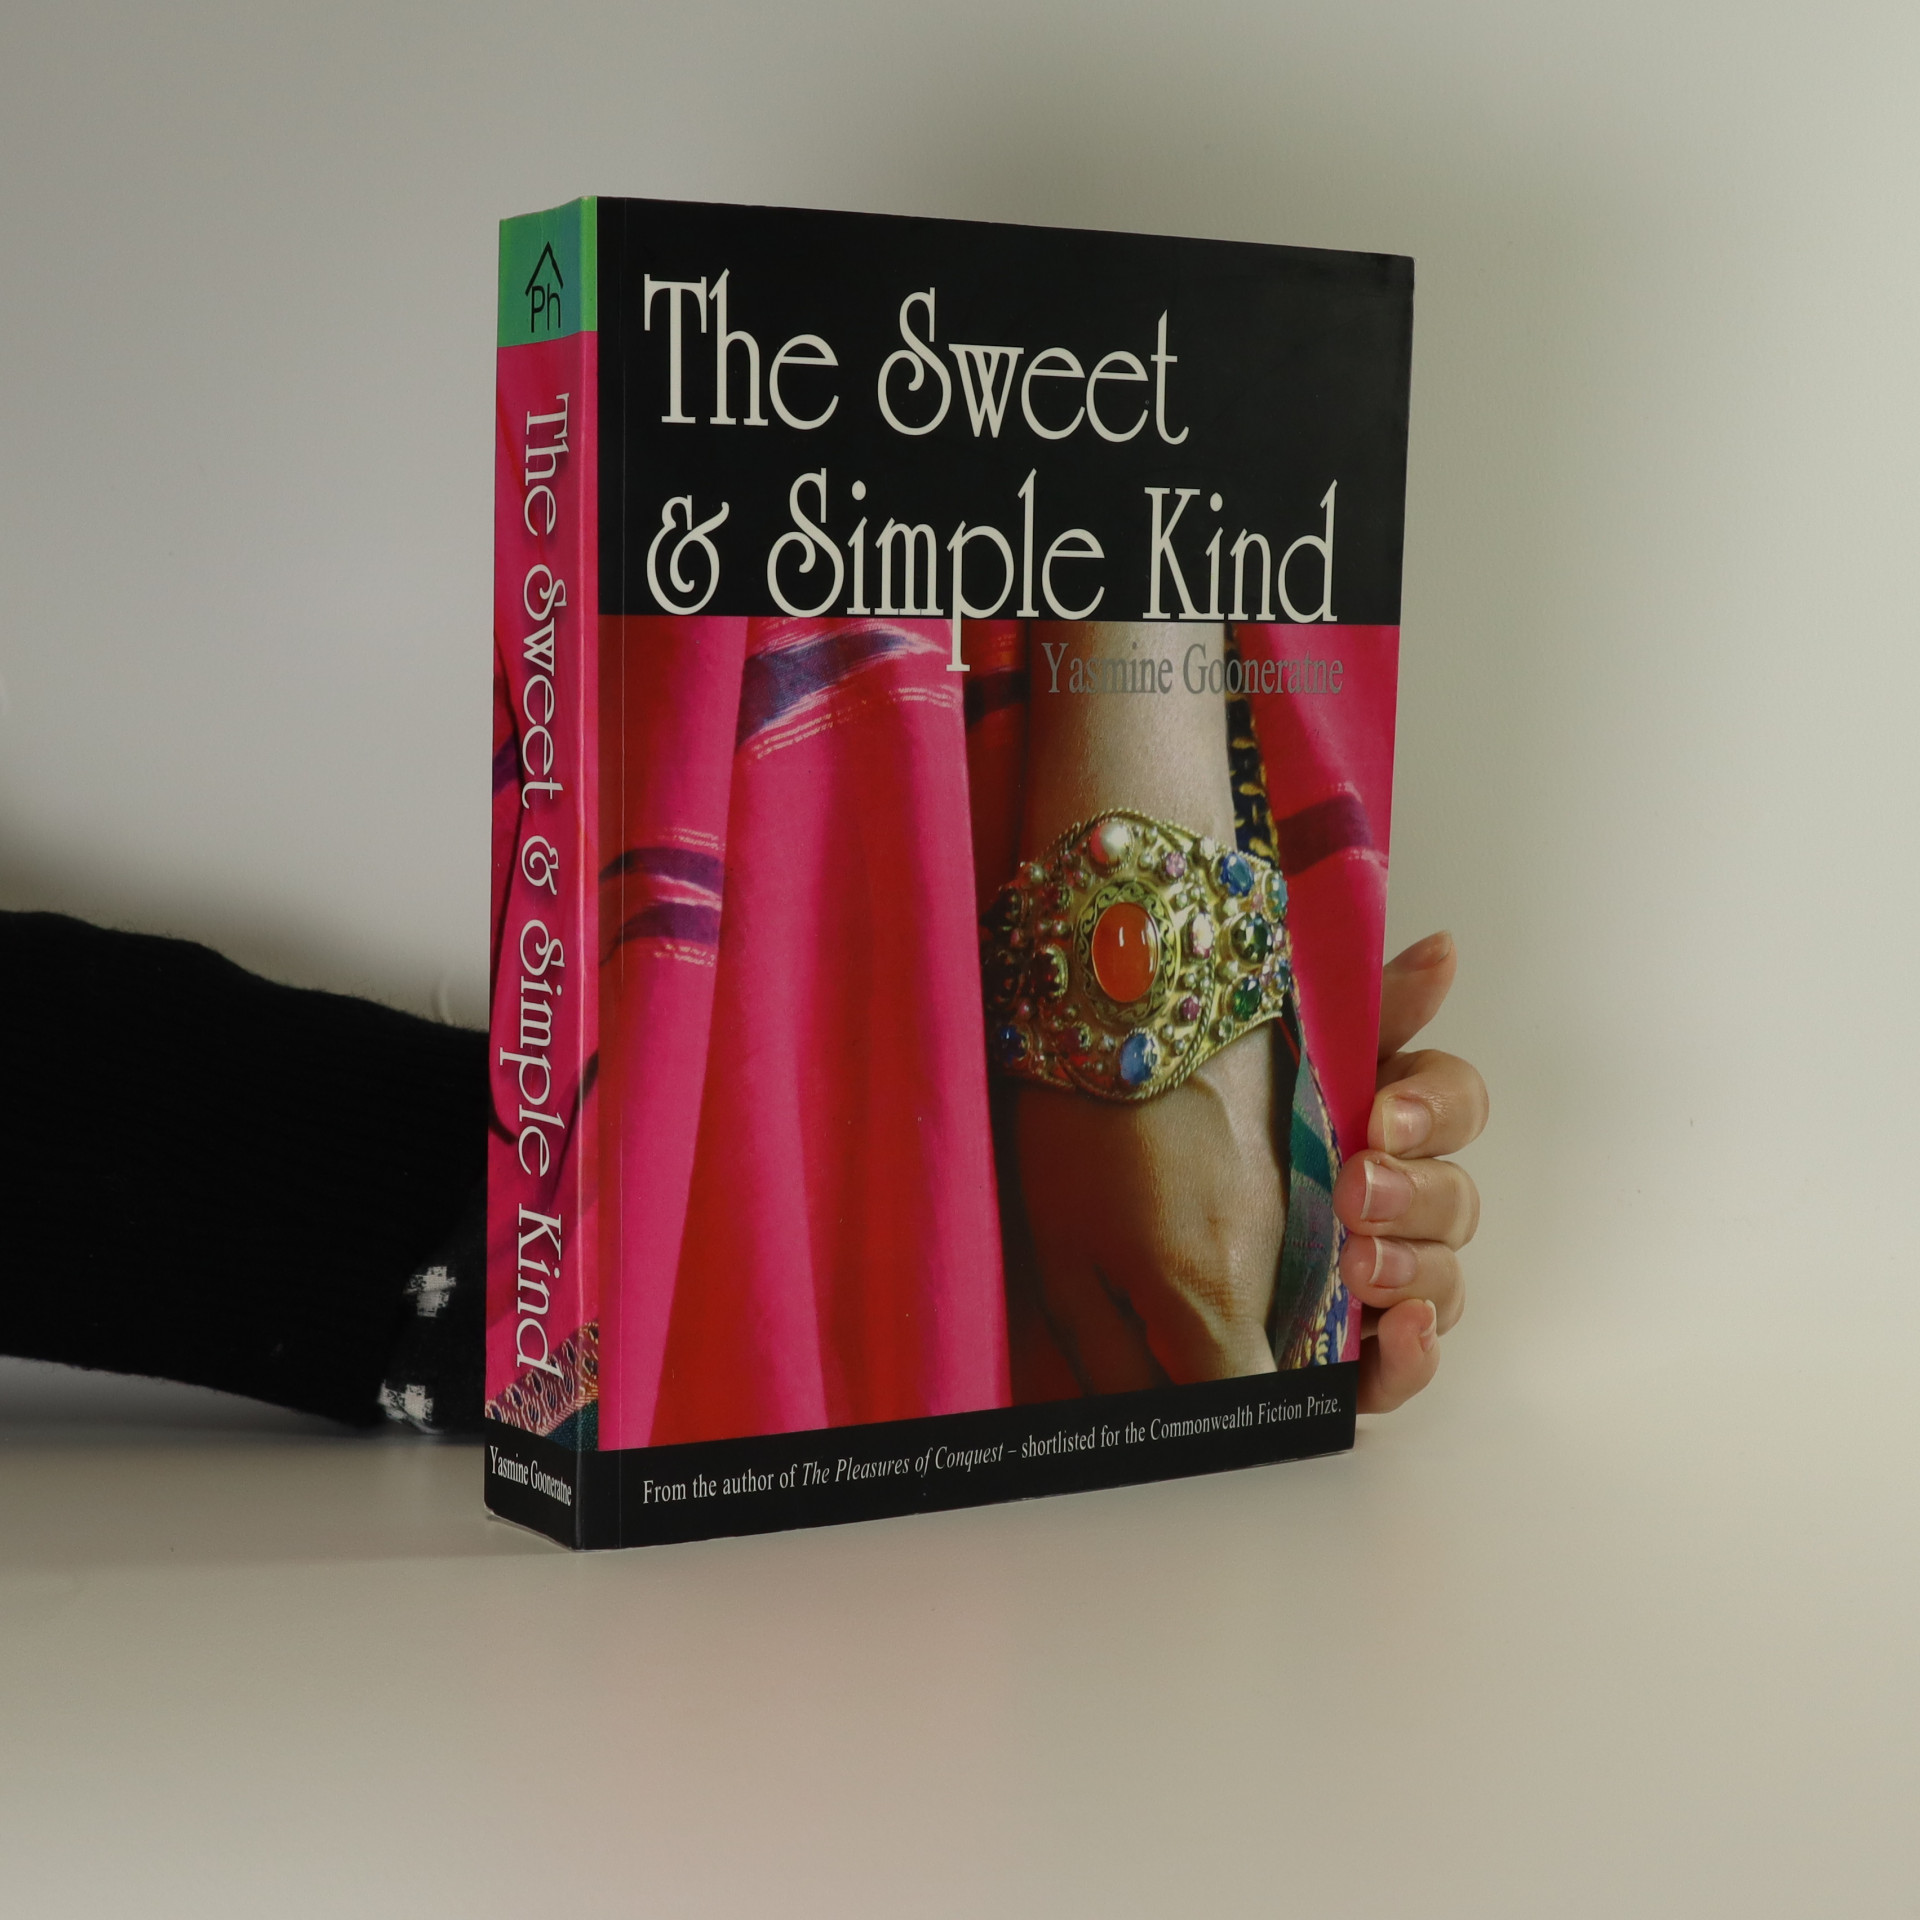 antikvární kniha The sweet & simple kind, 2006